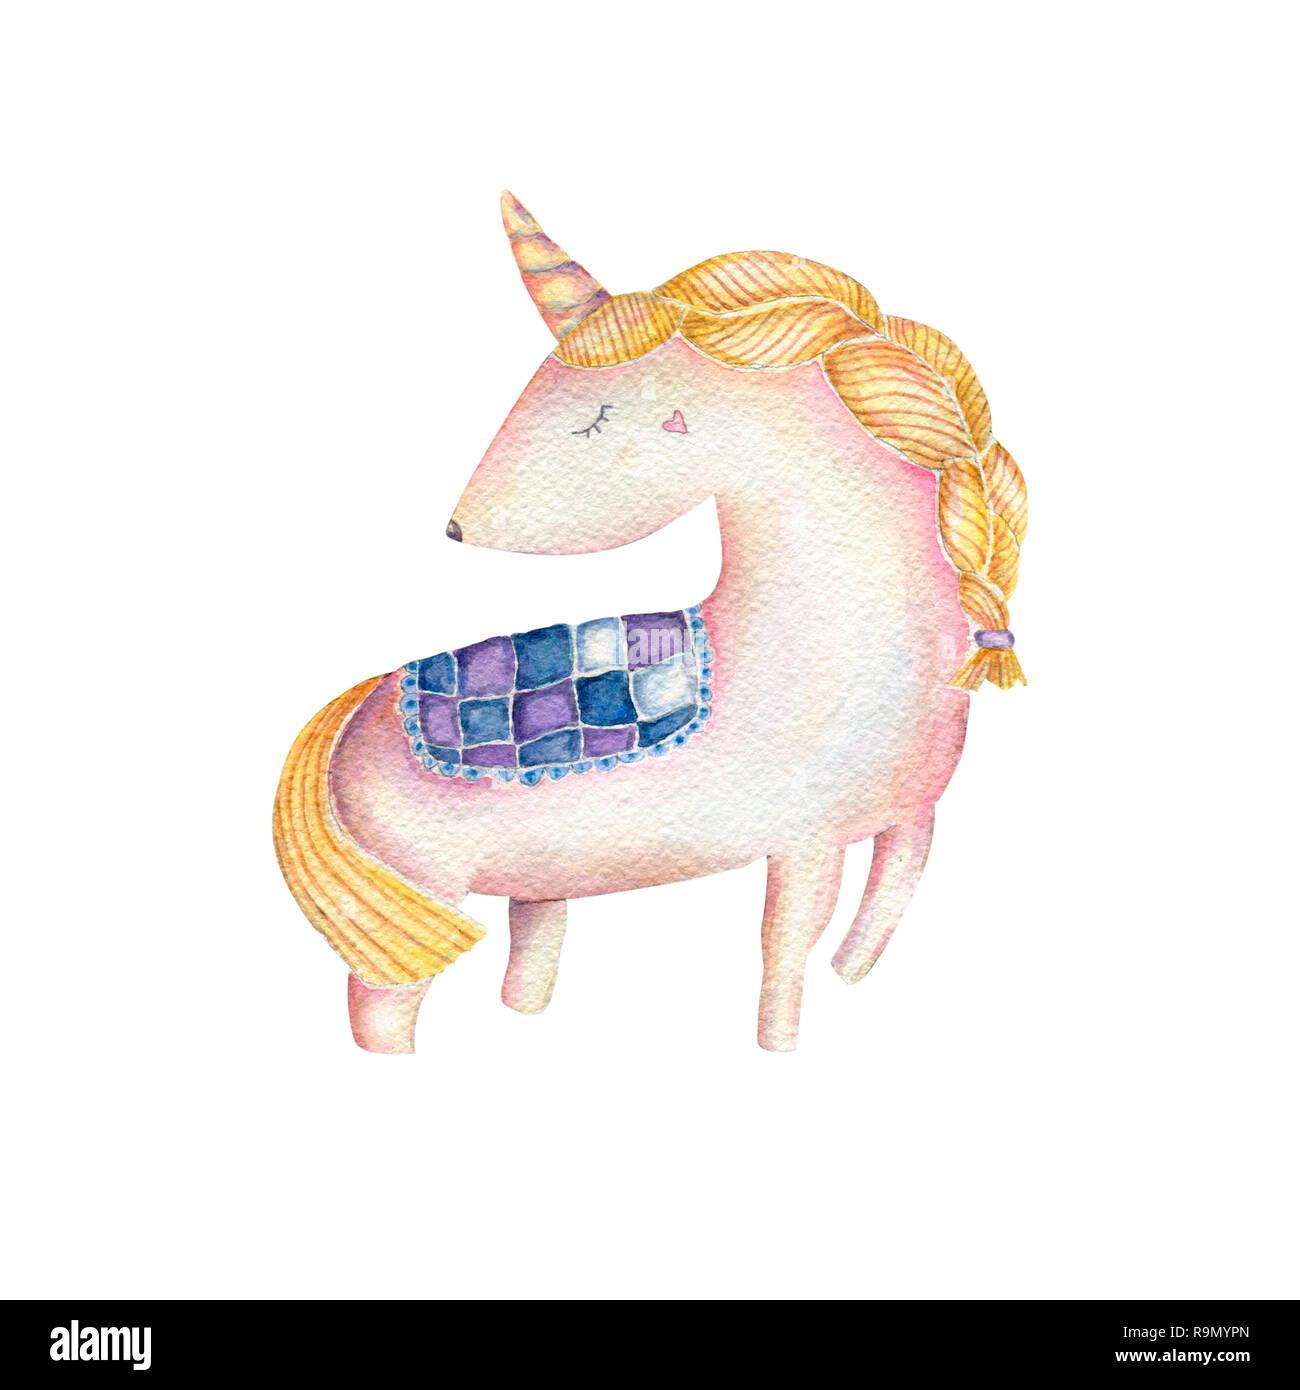 My Little Pony Unicorn Immagini My Little Pony Unicorn Fotos Stock